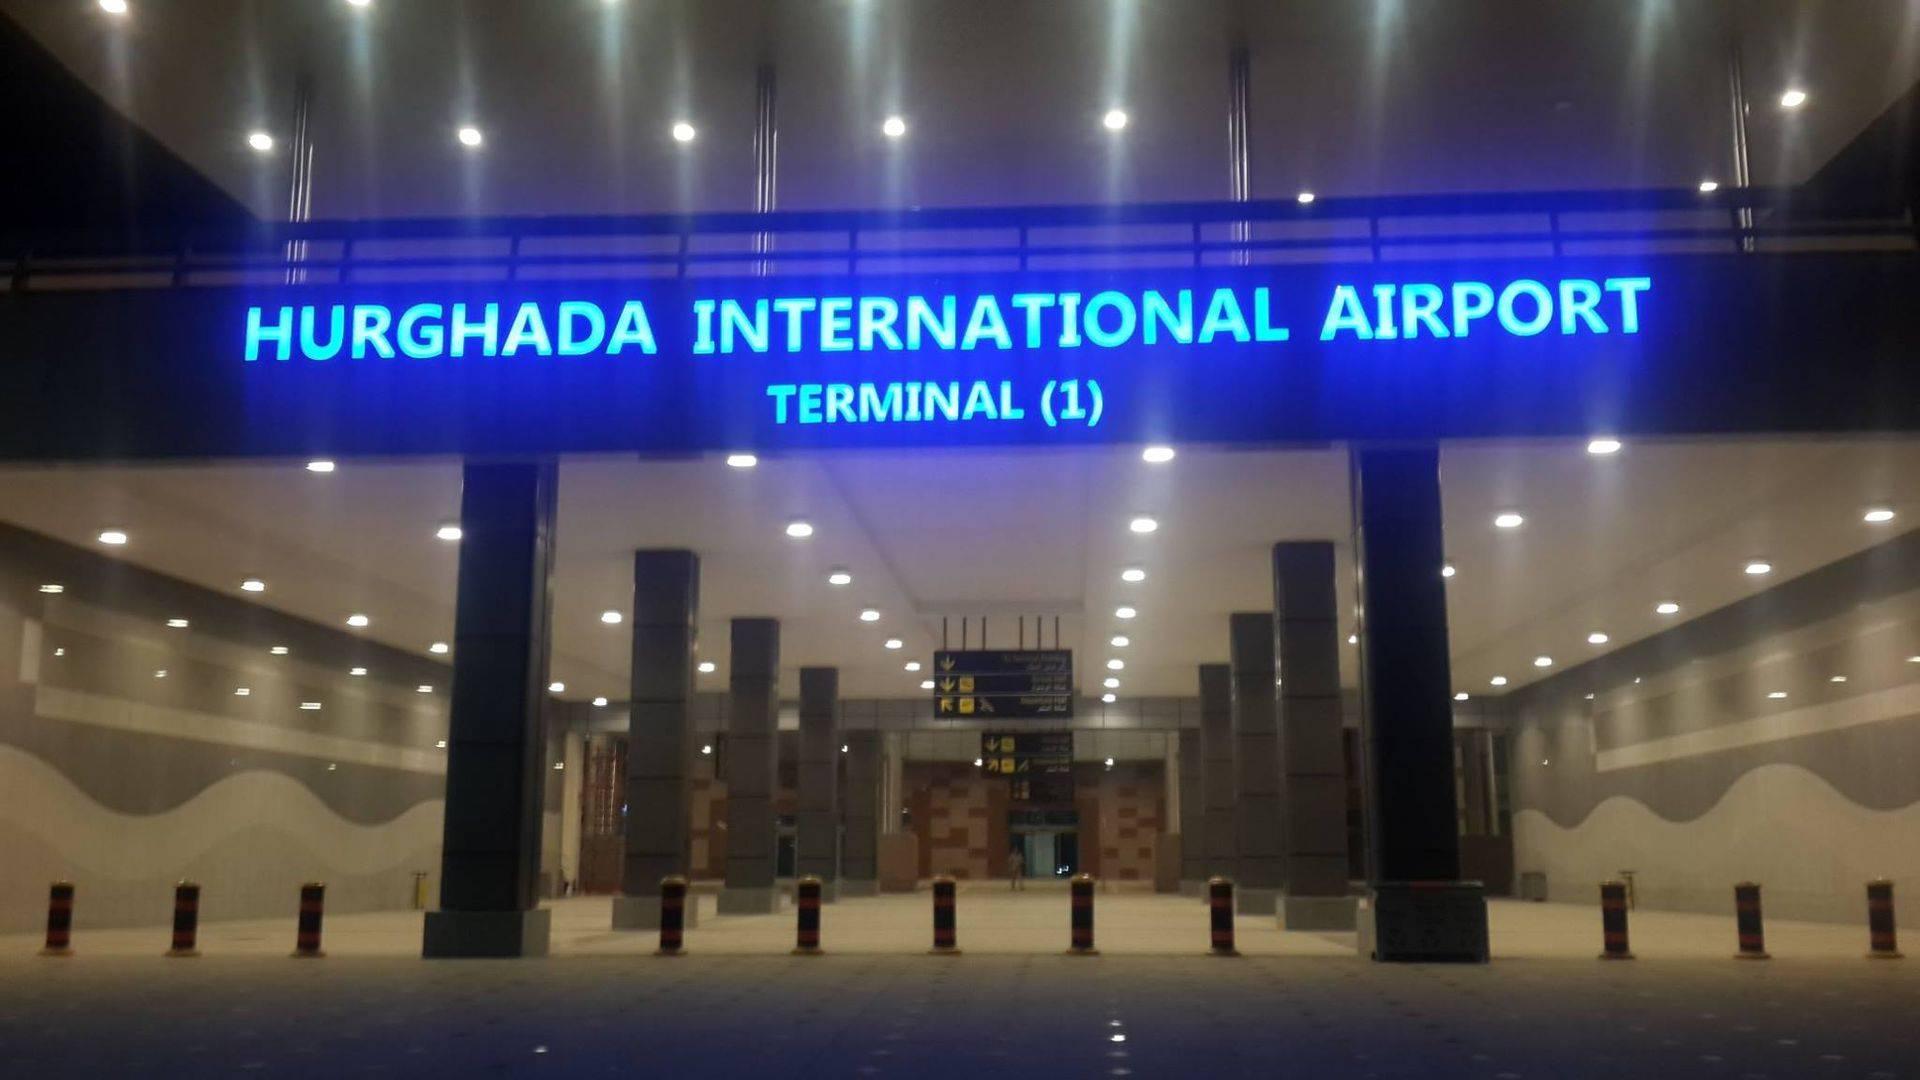 Hurghada Airport - New Terminal